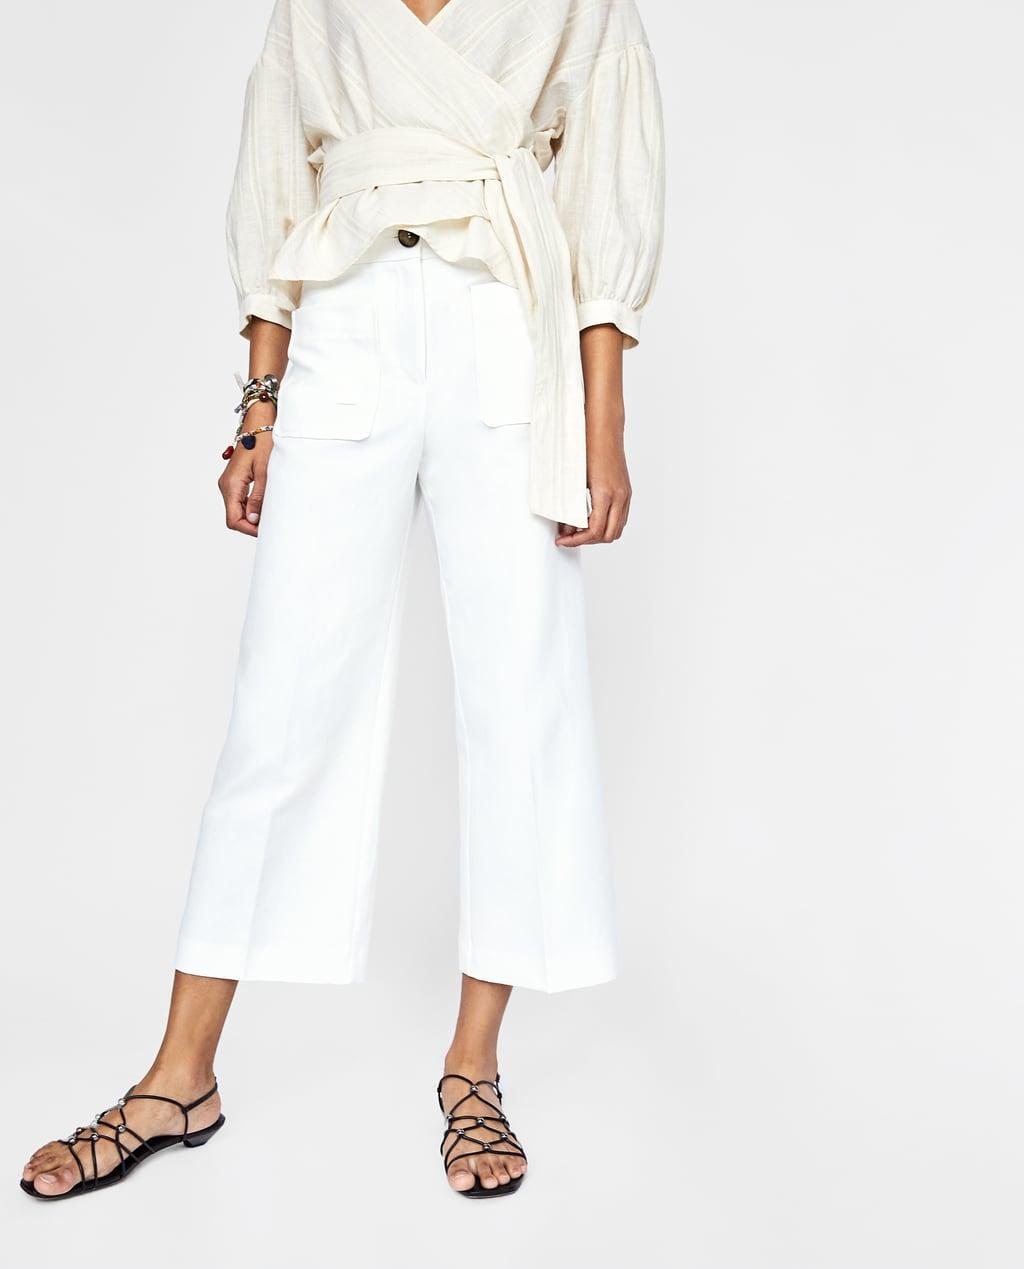 Zara-Trousers-With-Patch.jpg